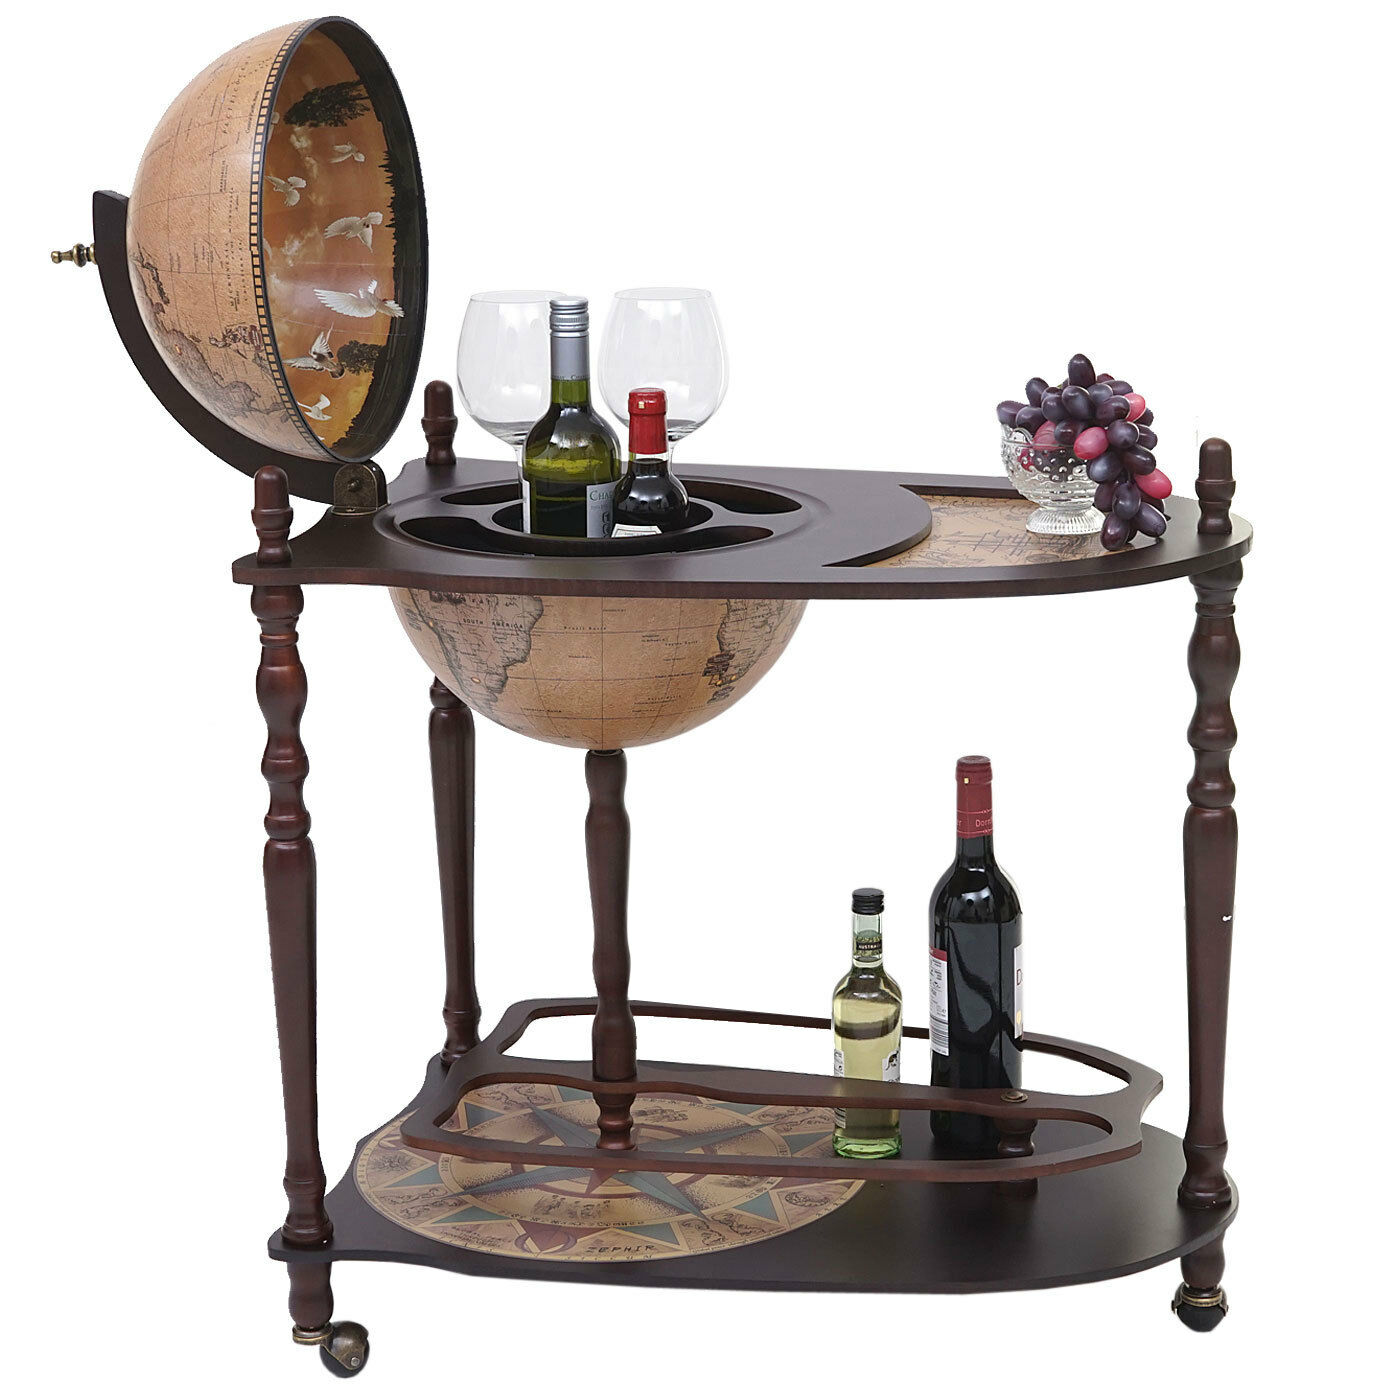 Globusbar avec table hwc-t875, mini bar Placard à alcool T', globe terrestre roulant le bois d'eucalyptus